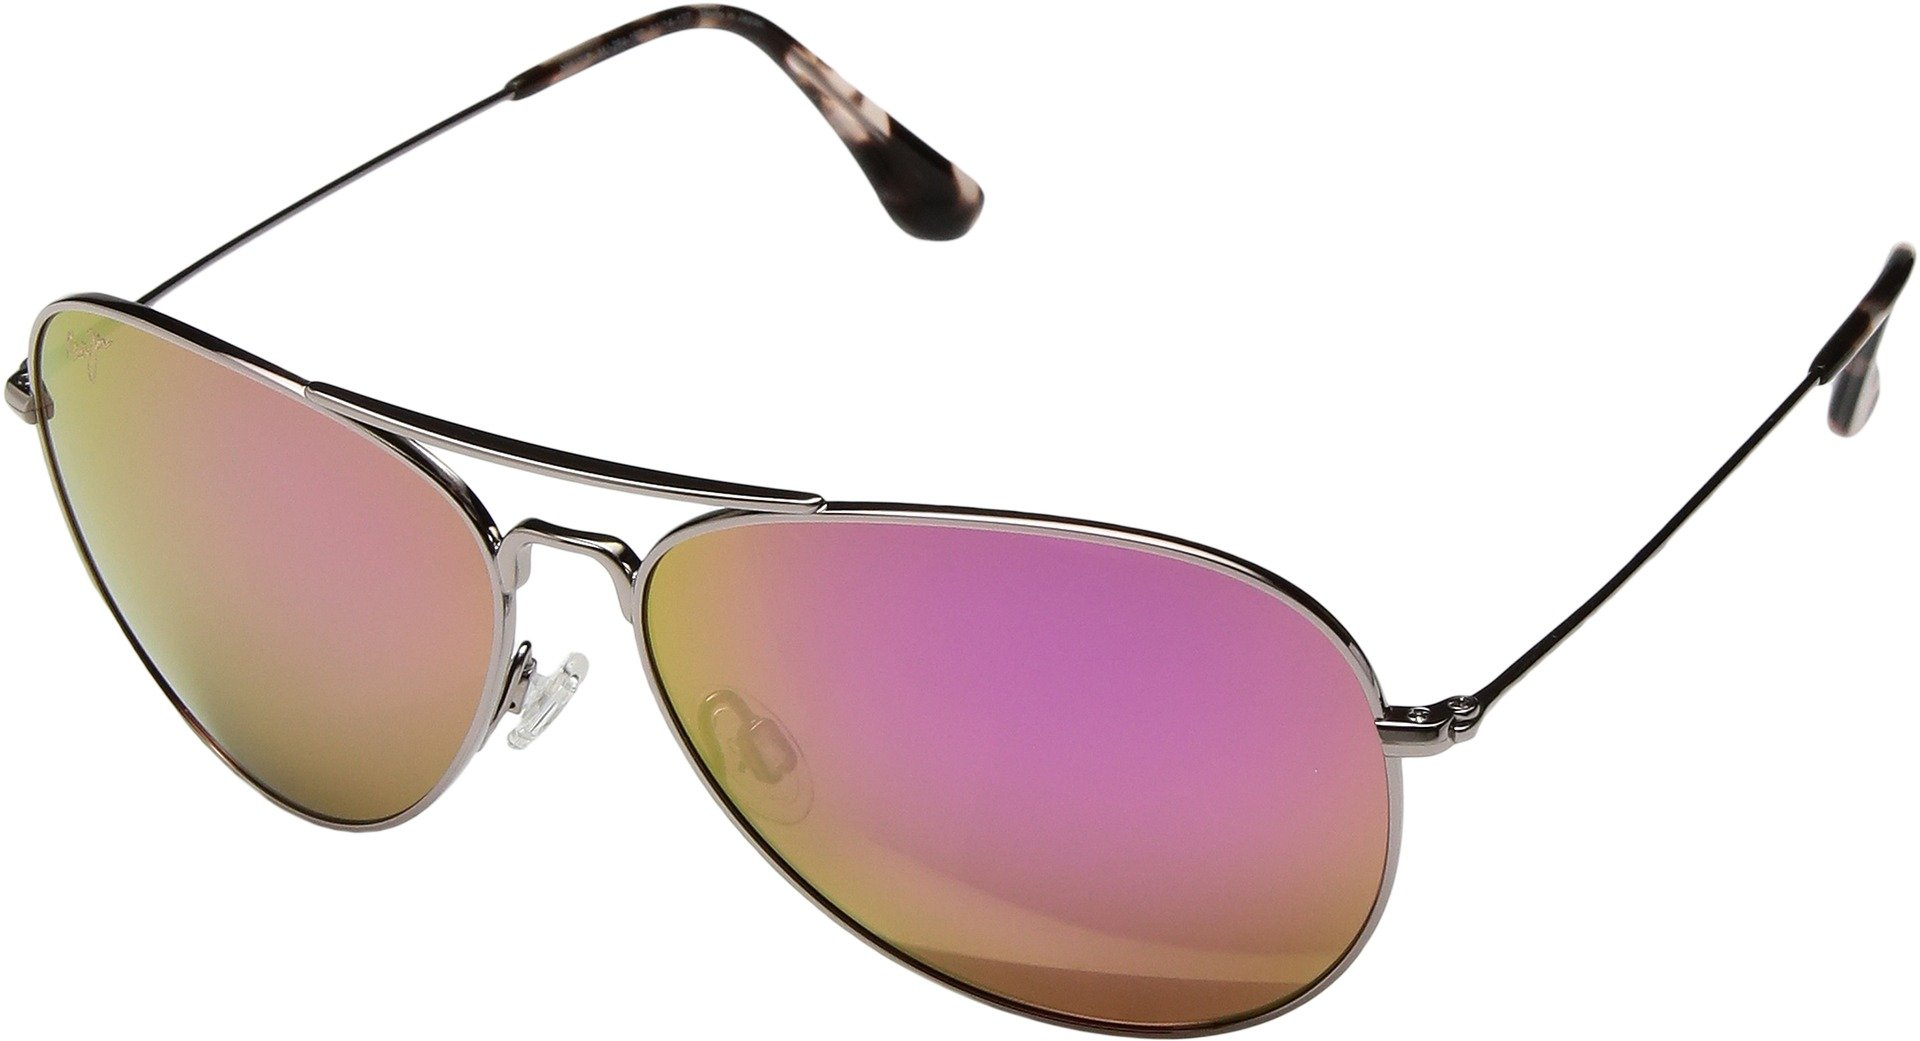 Maui Jim Unisex Mavericks Rose Gold/Maui Sunrise (Pink) Sunglasses